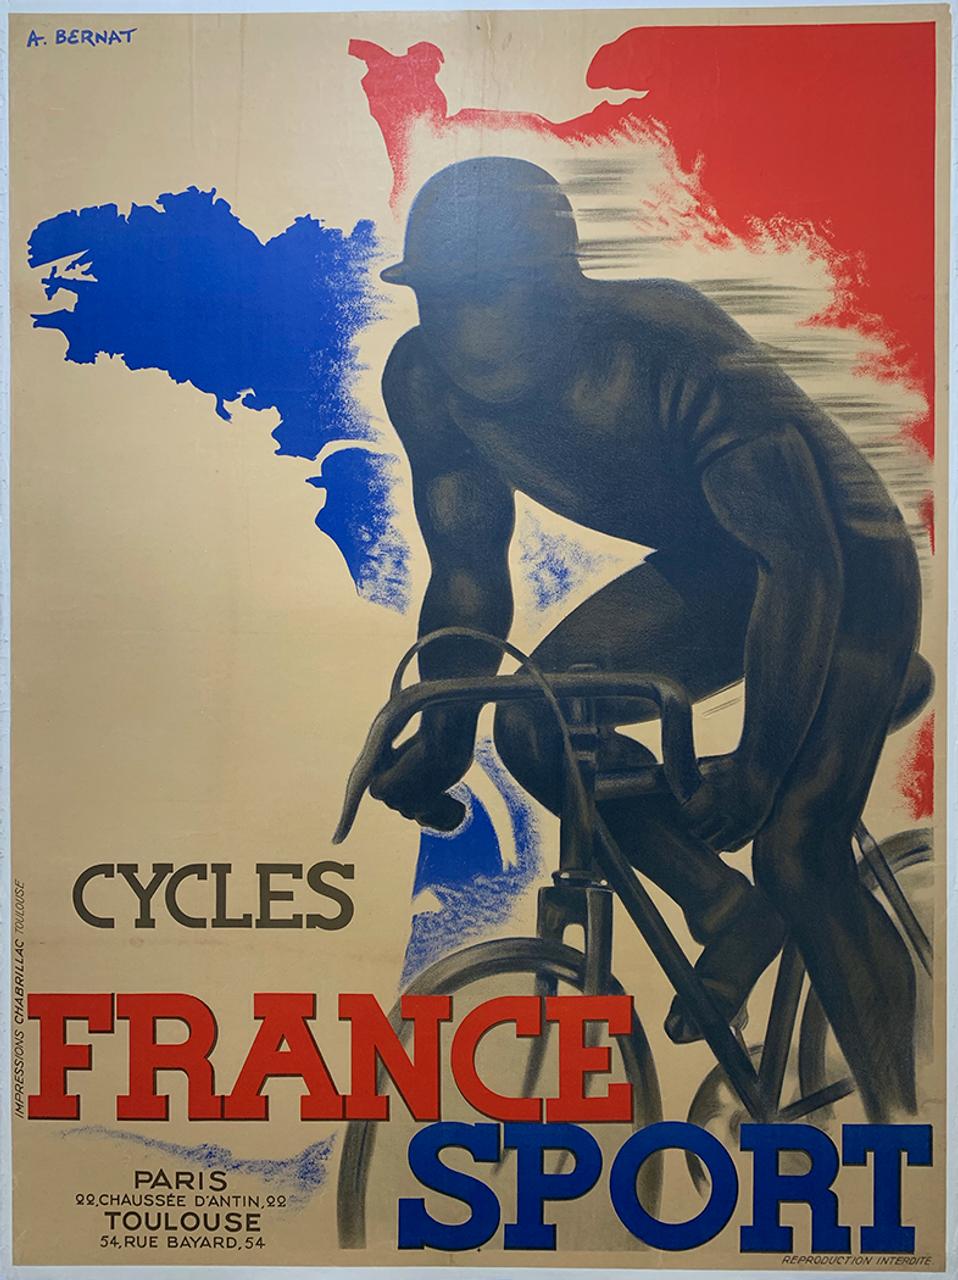 France Sport Original Vintage  Bicycle Poster by A. Bernat